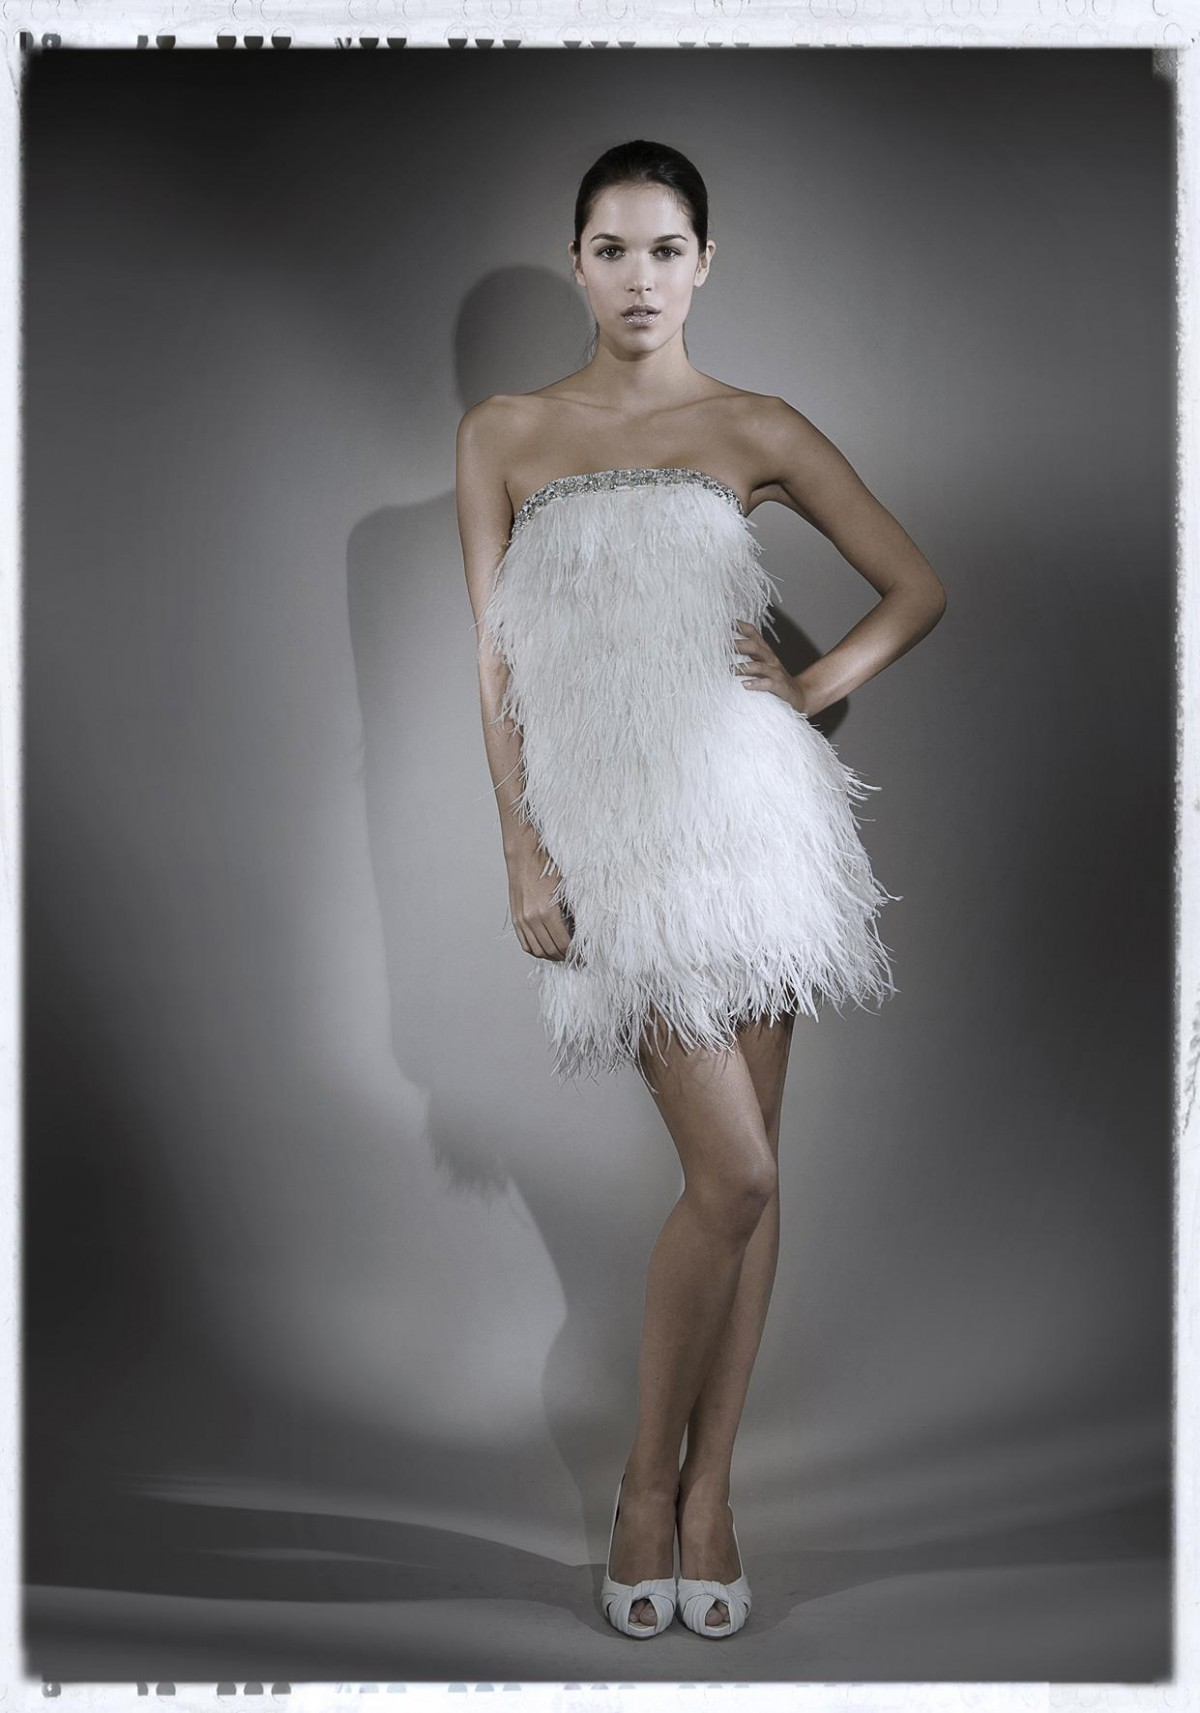 robes de mariee convoler dans les plumes mariage commariage - Robe Charleston Mariage